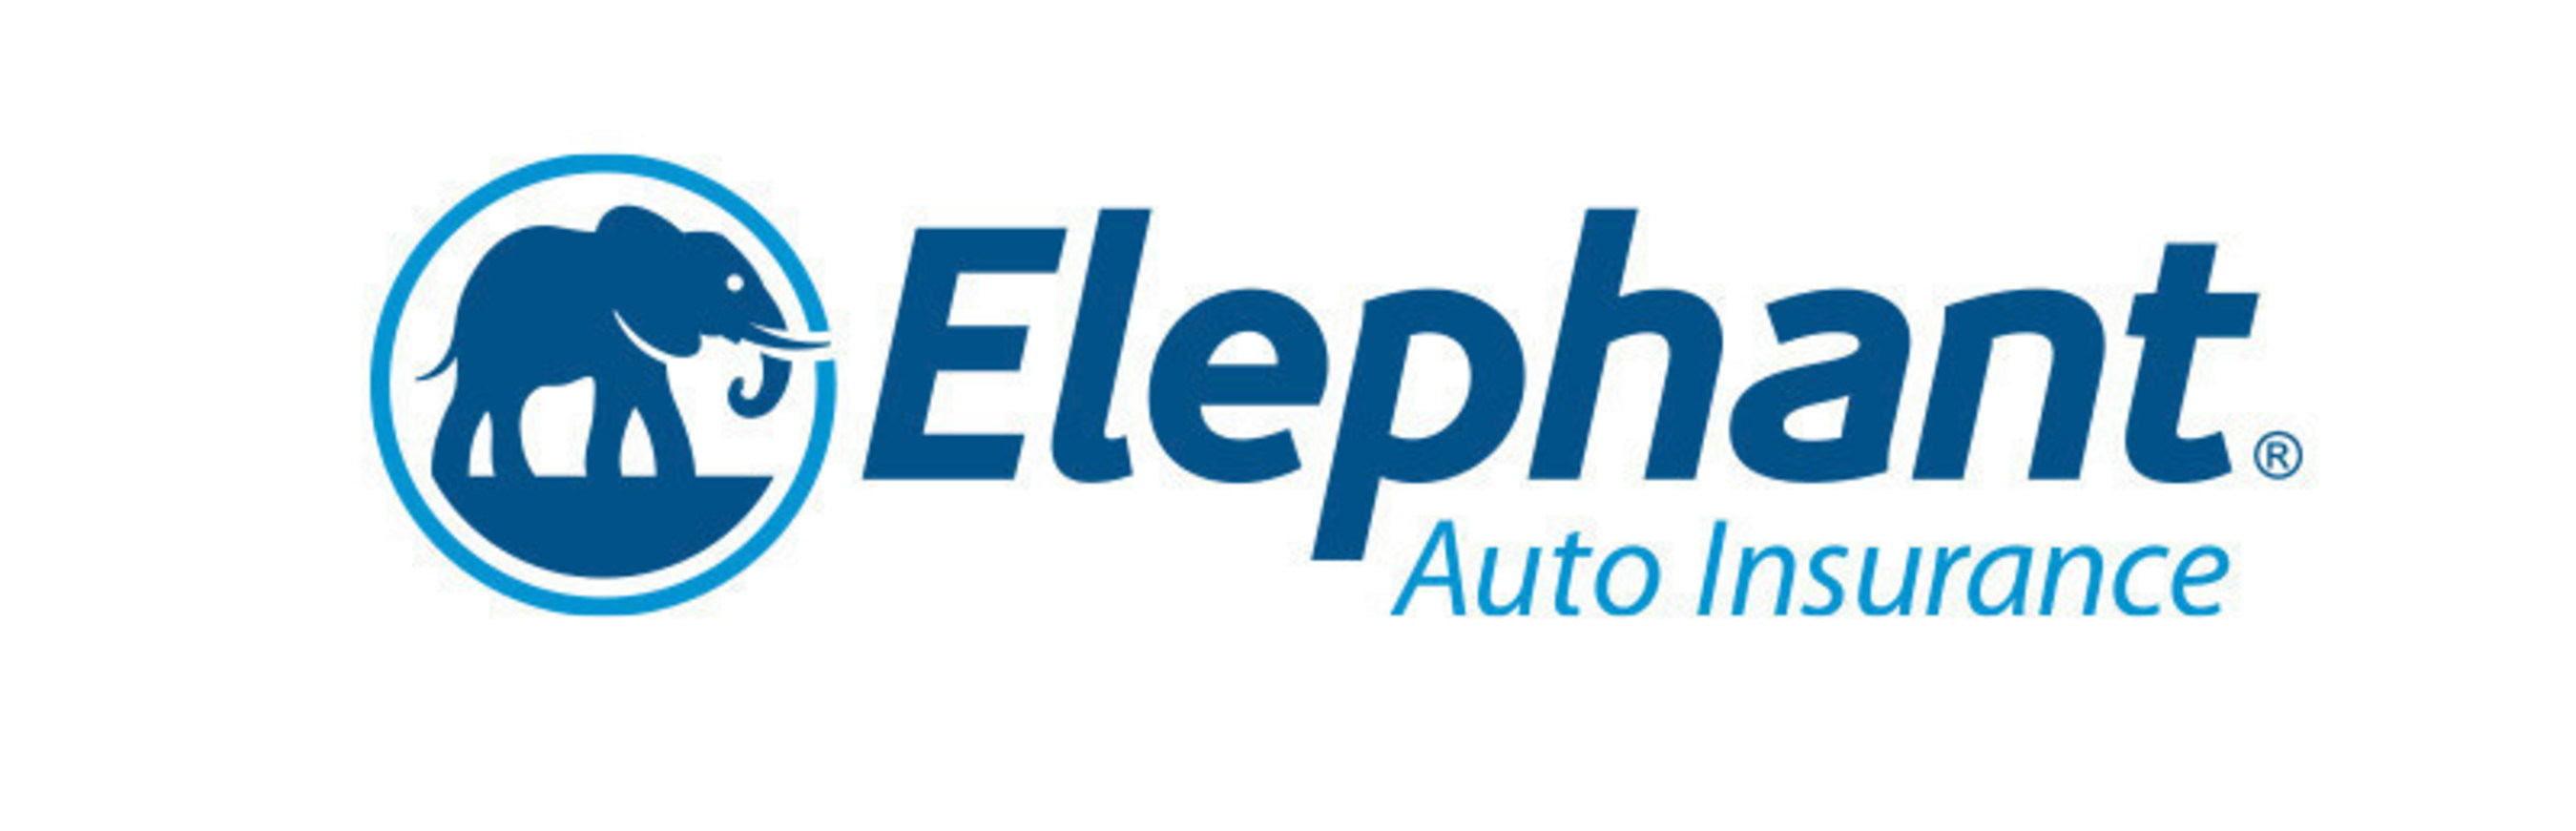 Elephant Auto Insurance sponsors Ukrop's Monument Avenue 10k